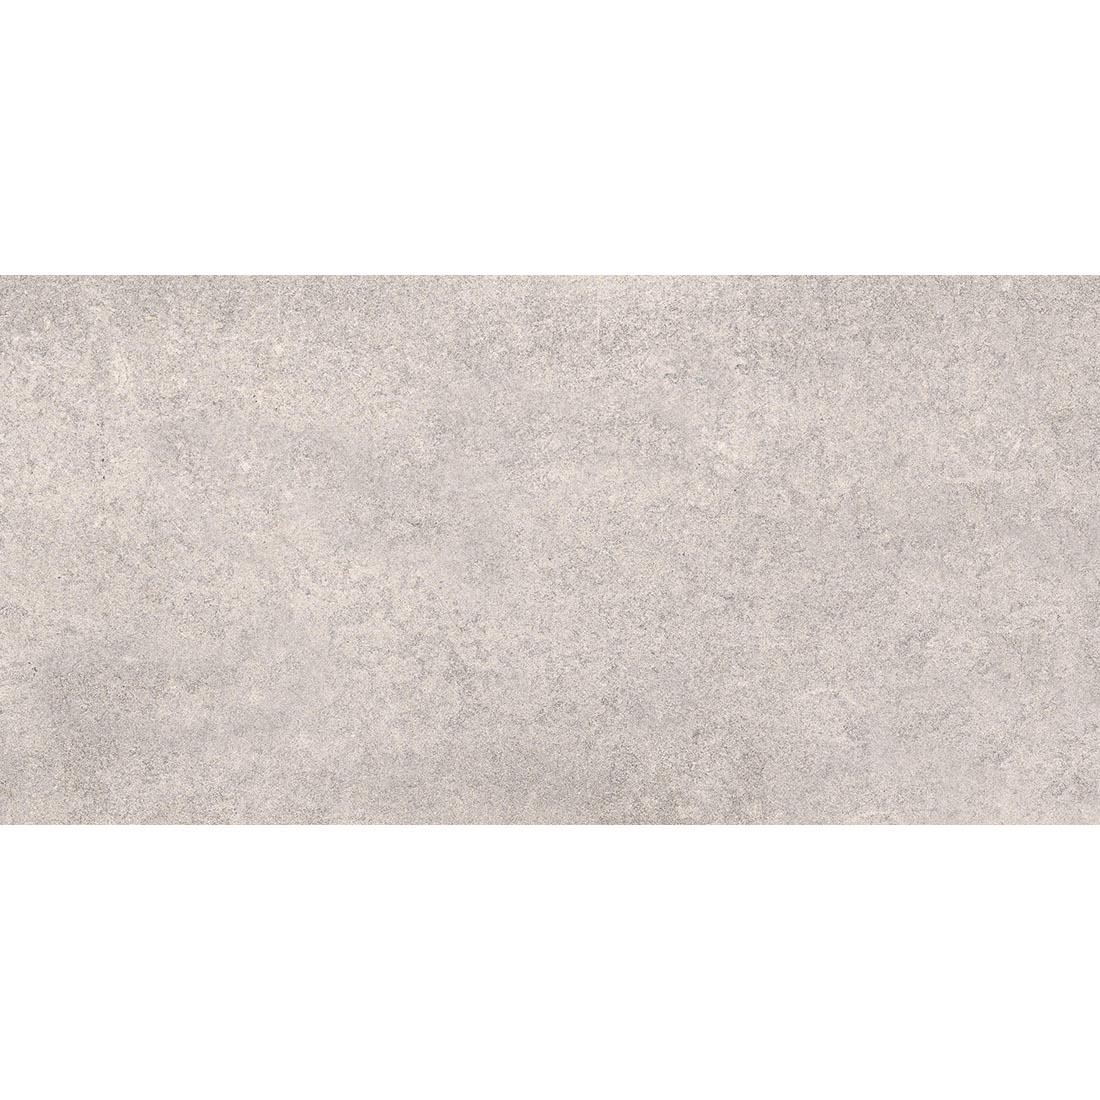 Cementk 30x60 Grey Matt R10 1